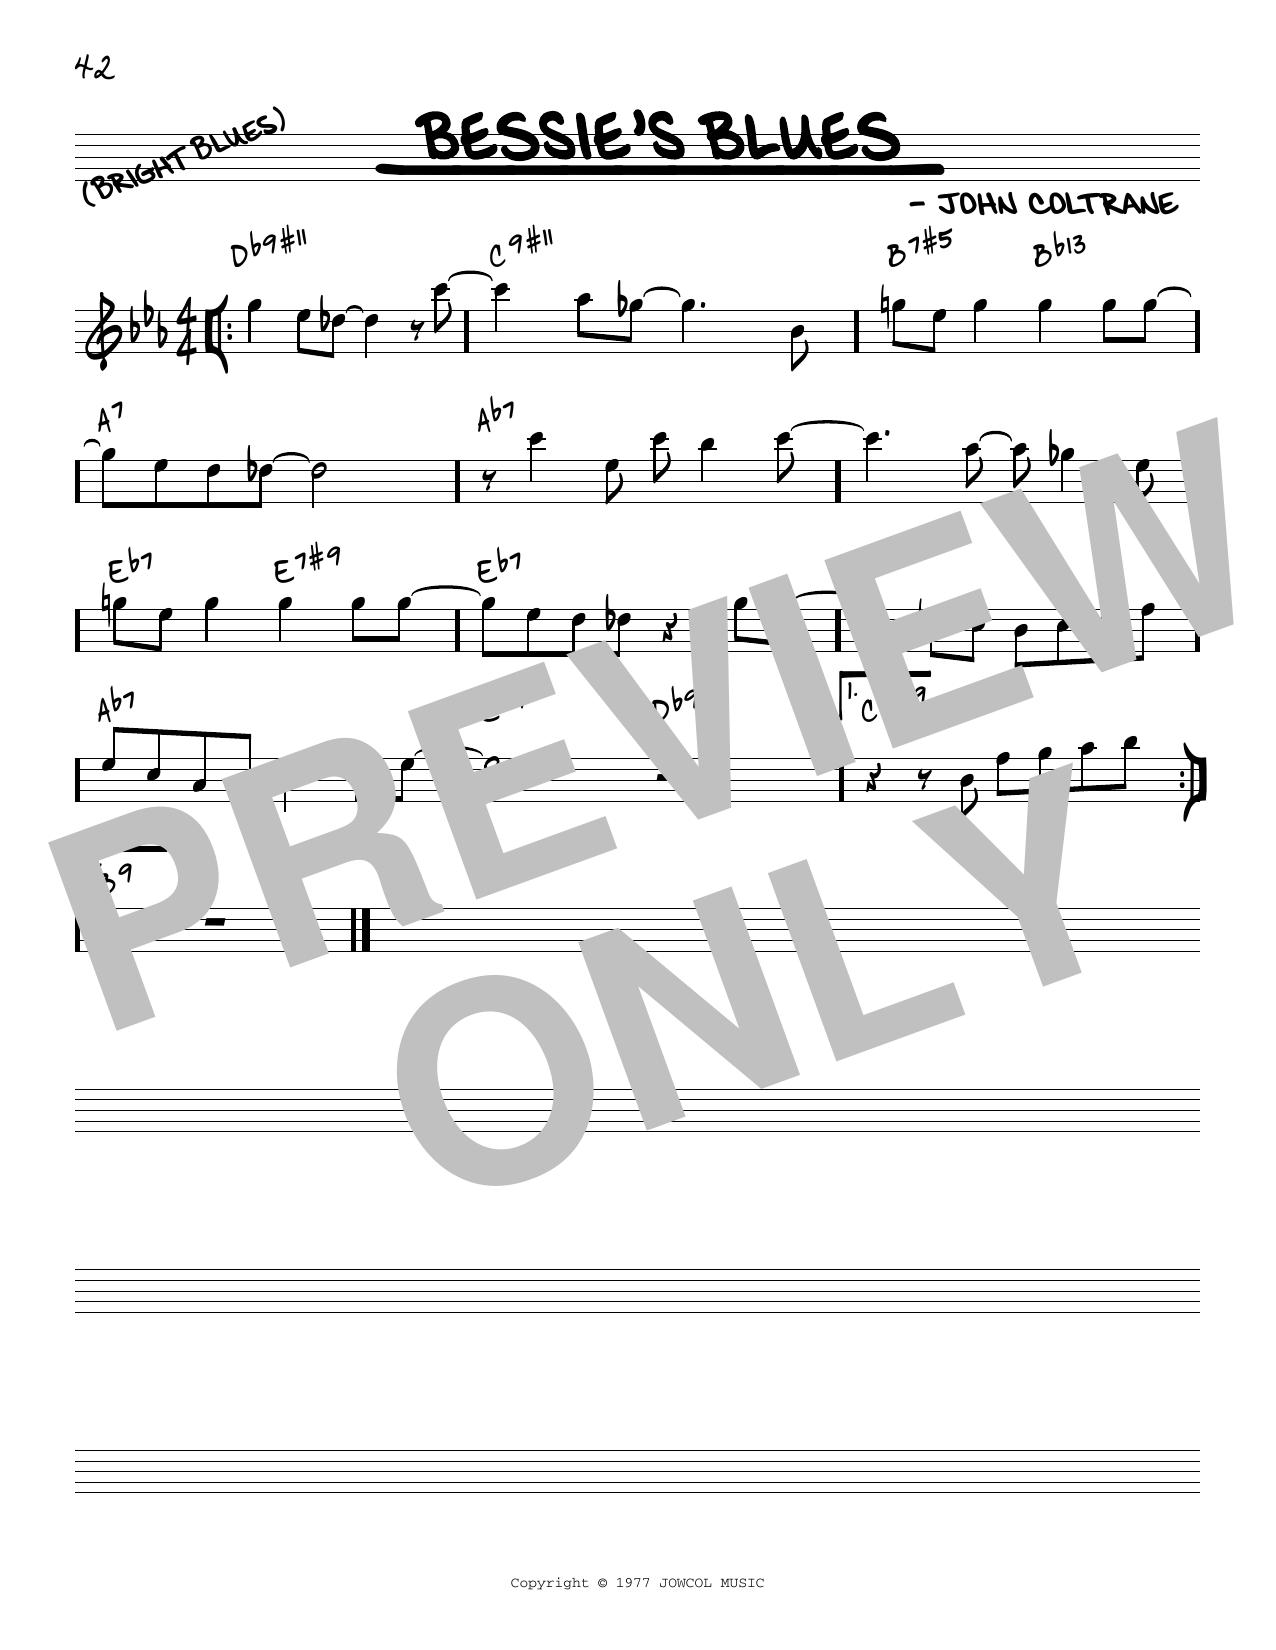 John Coltrane Bessie's Blues [Reharmonized version] (arr. Jack Grassel) sheet music notes printable PDF score